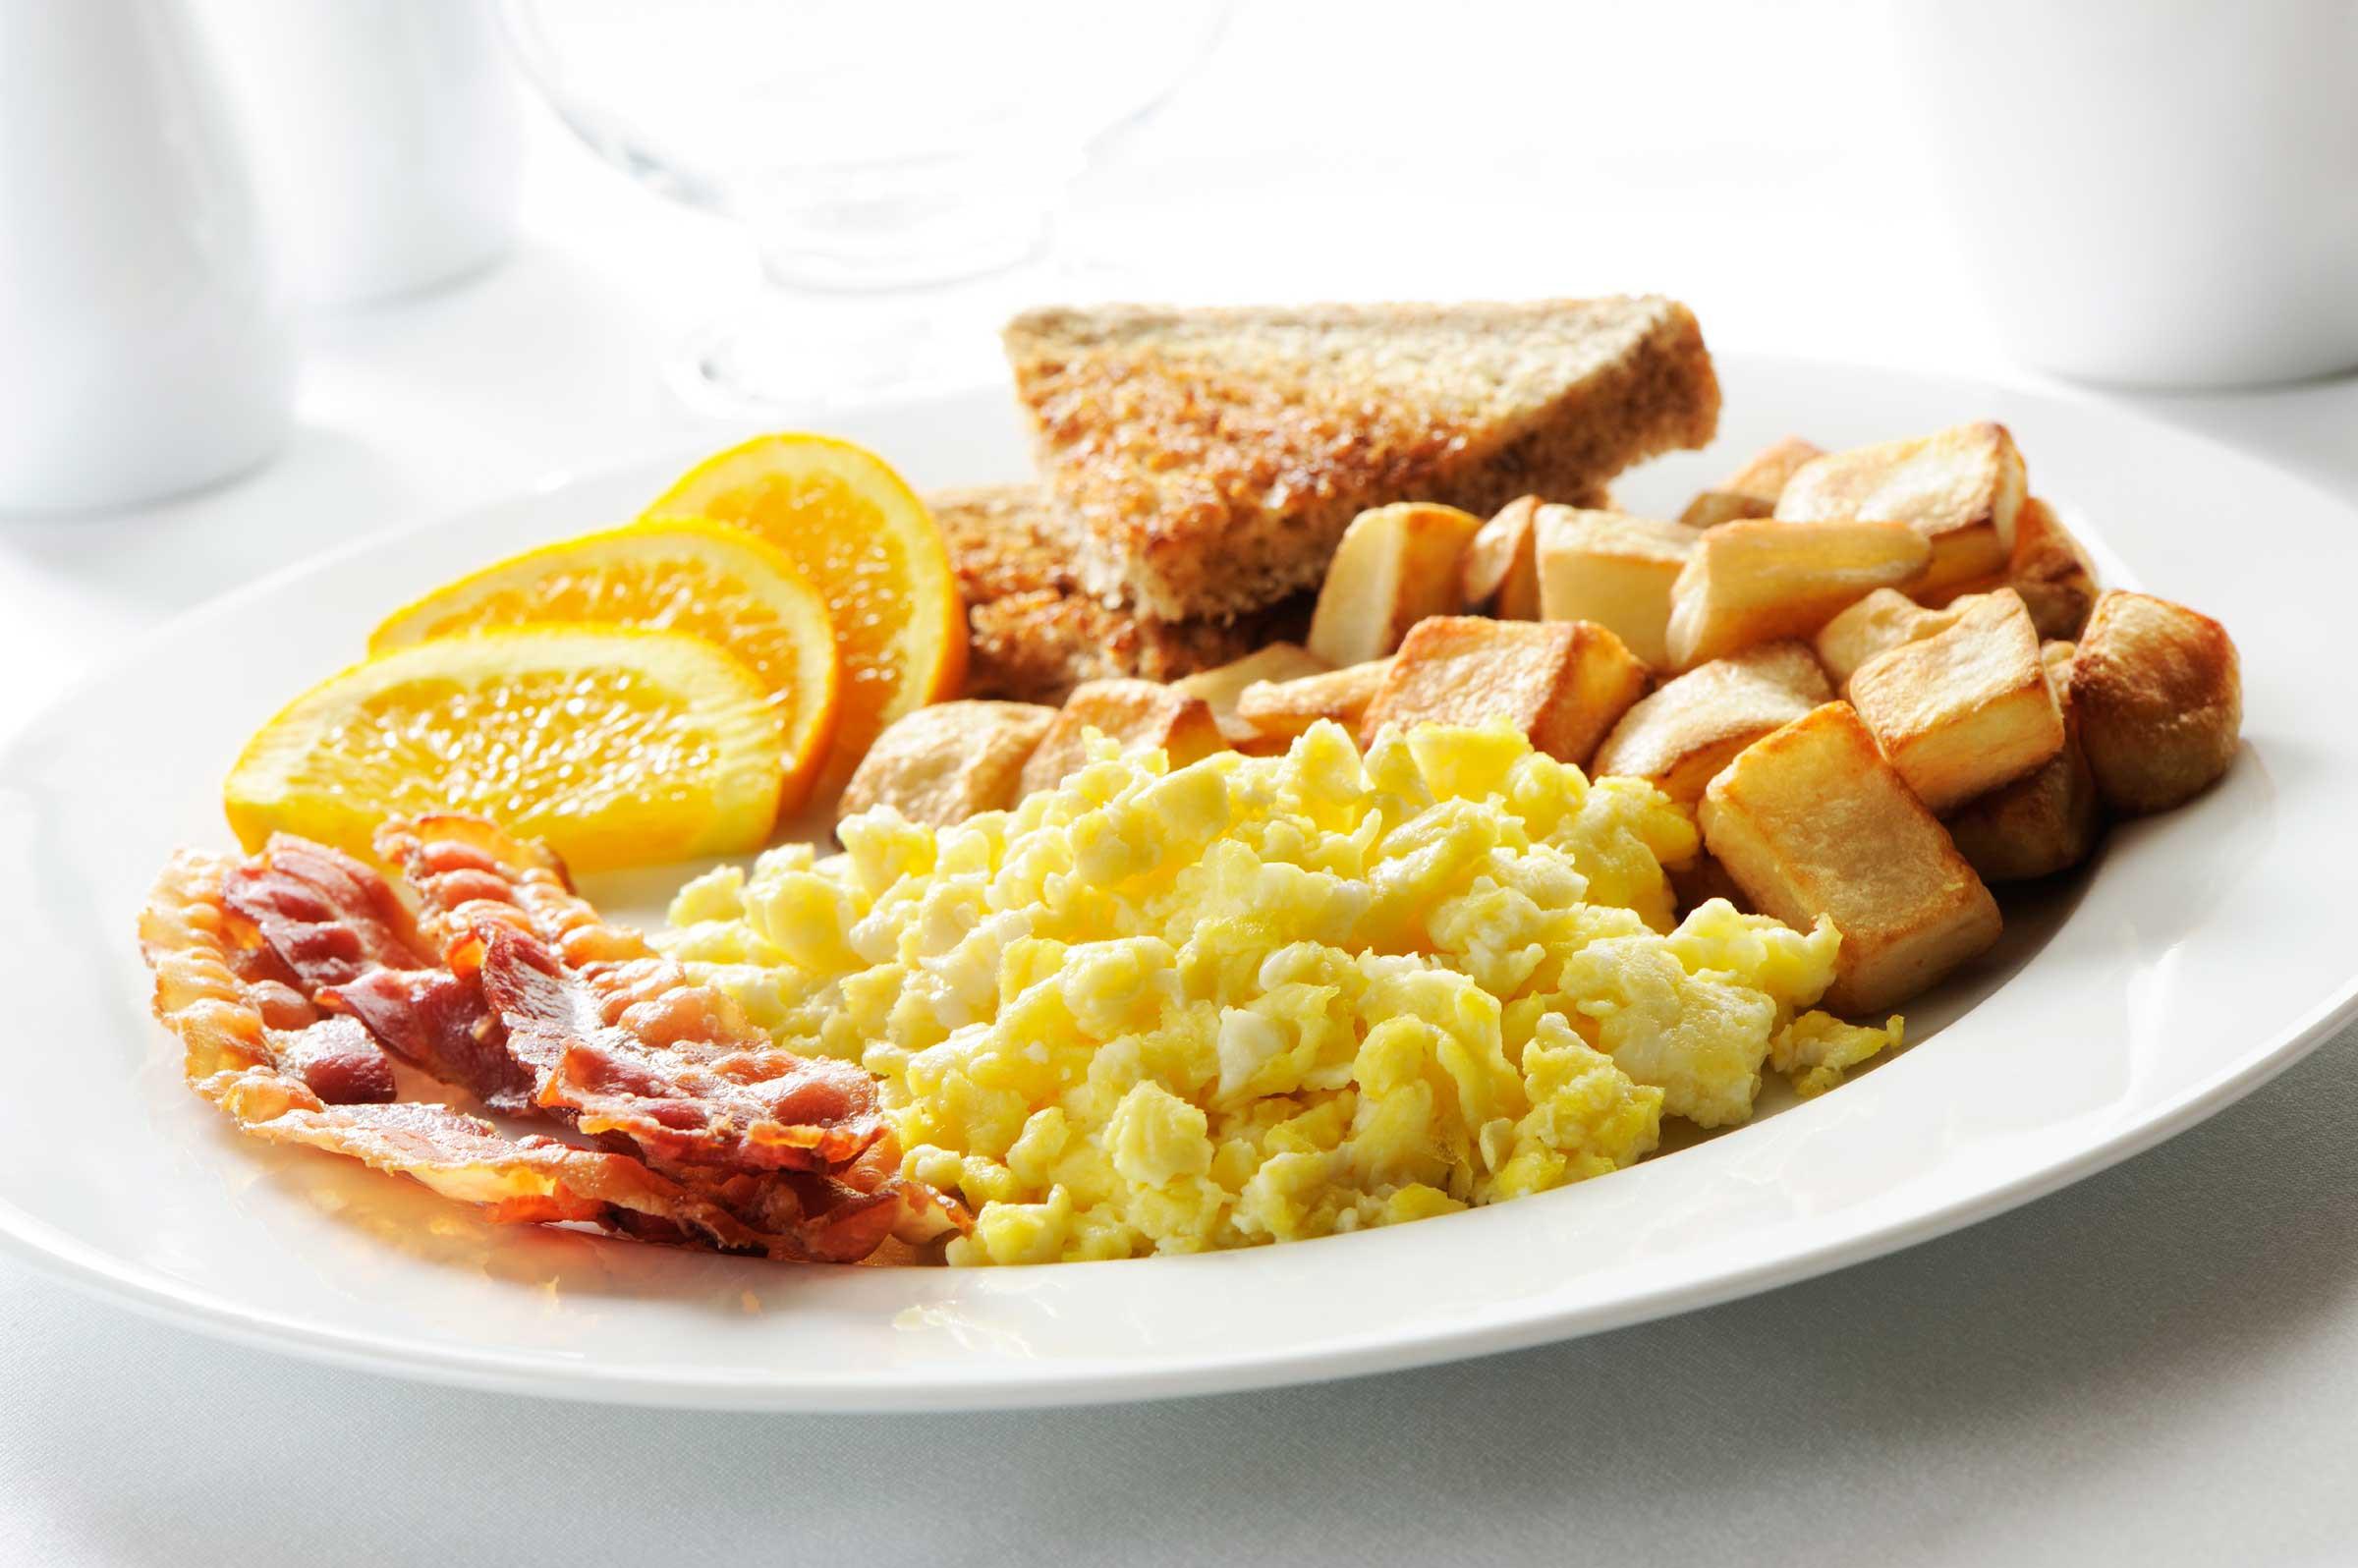 Healthy Breakfast For Diabetics  Breakfast for Diabetics 11 Healthy Tips